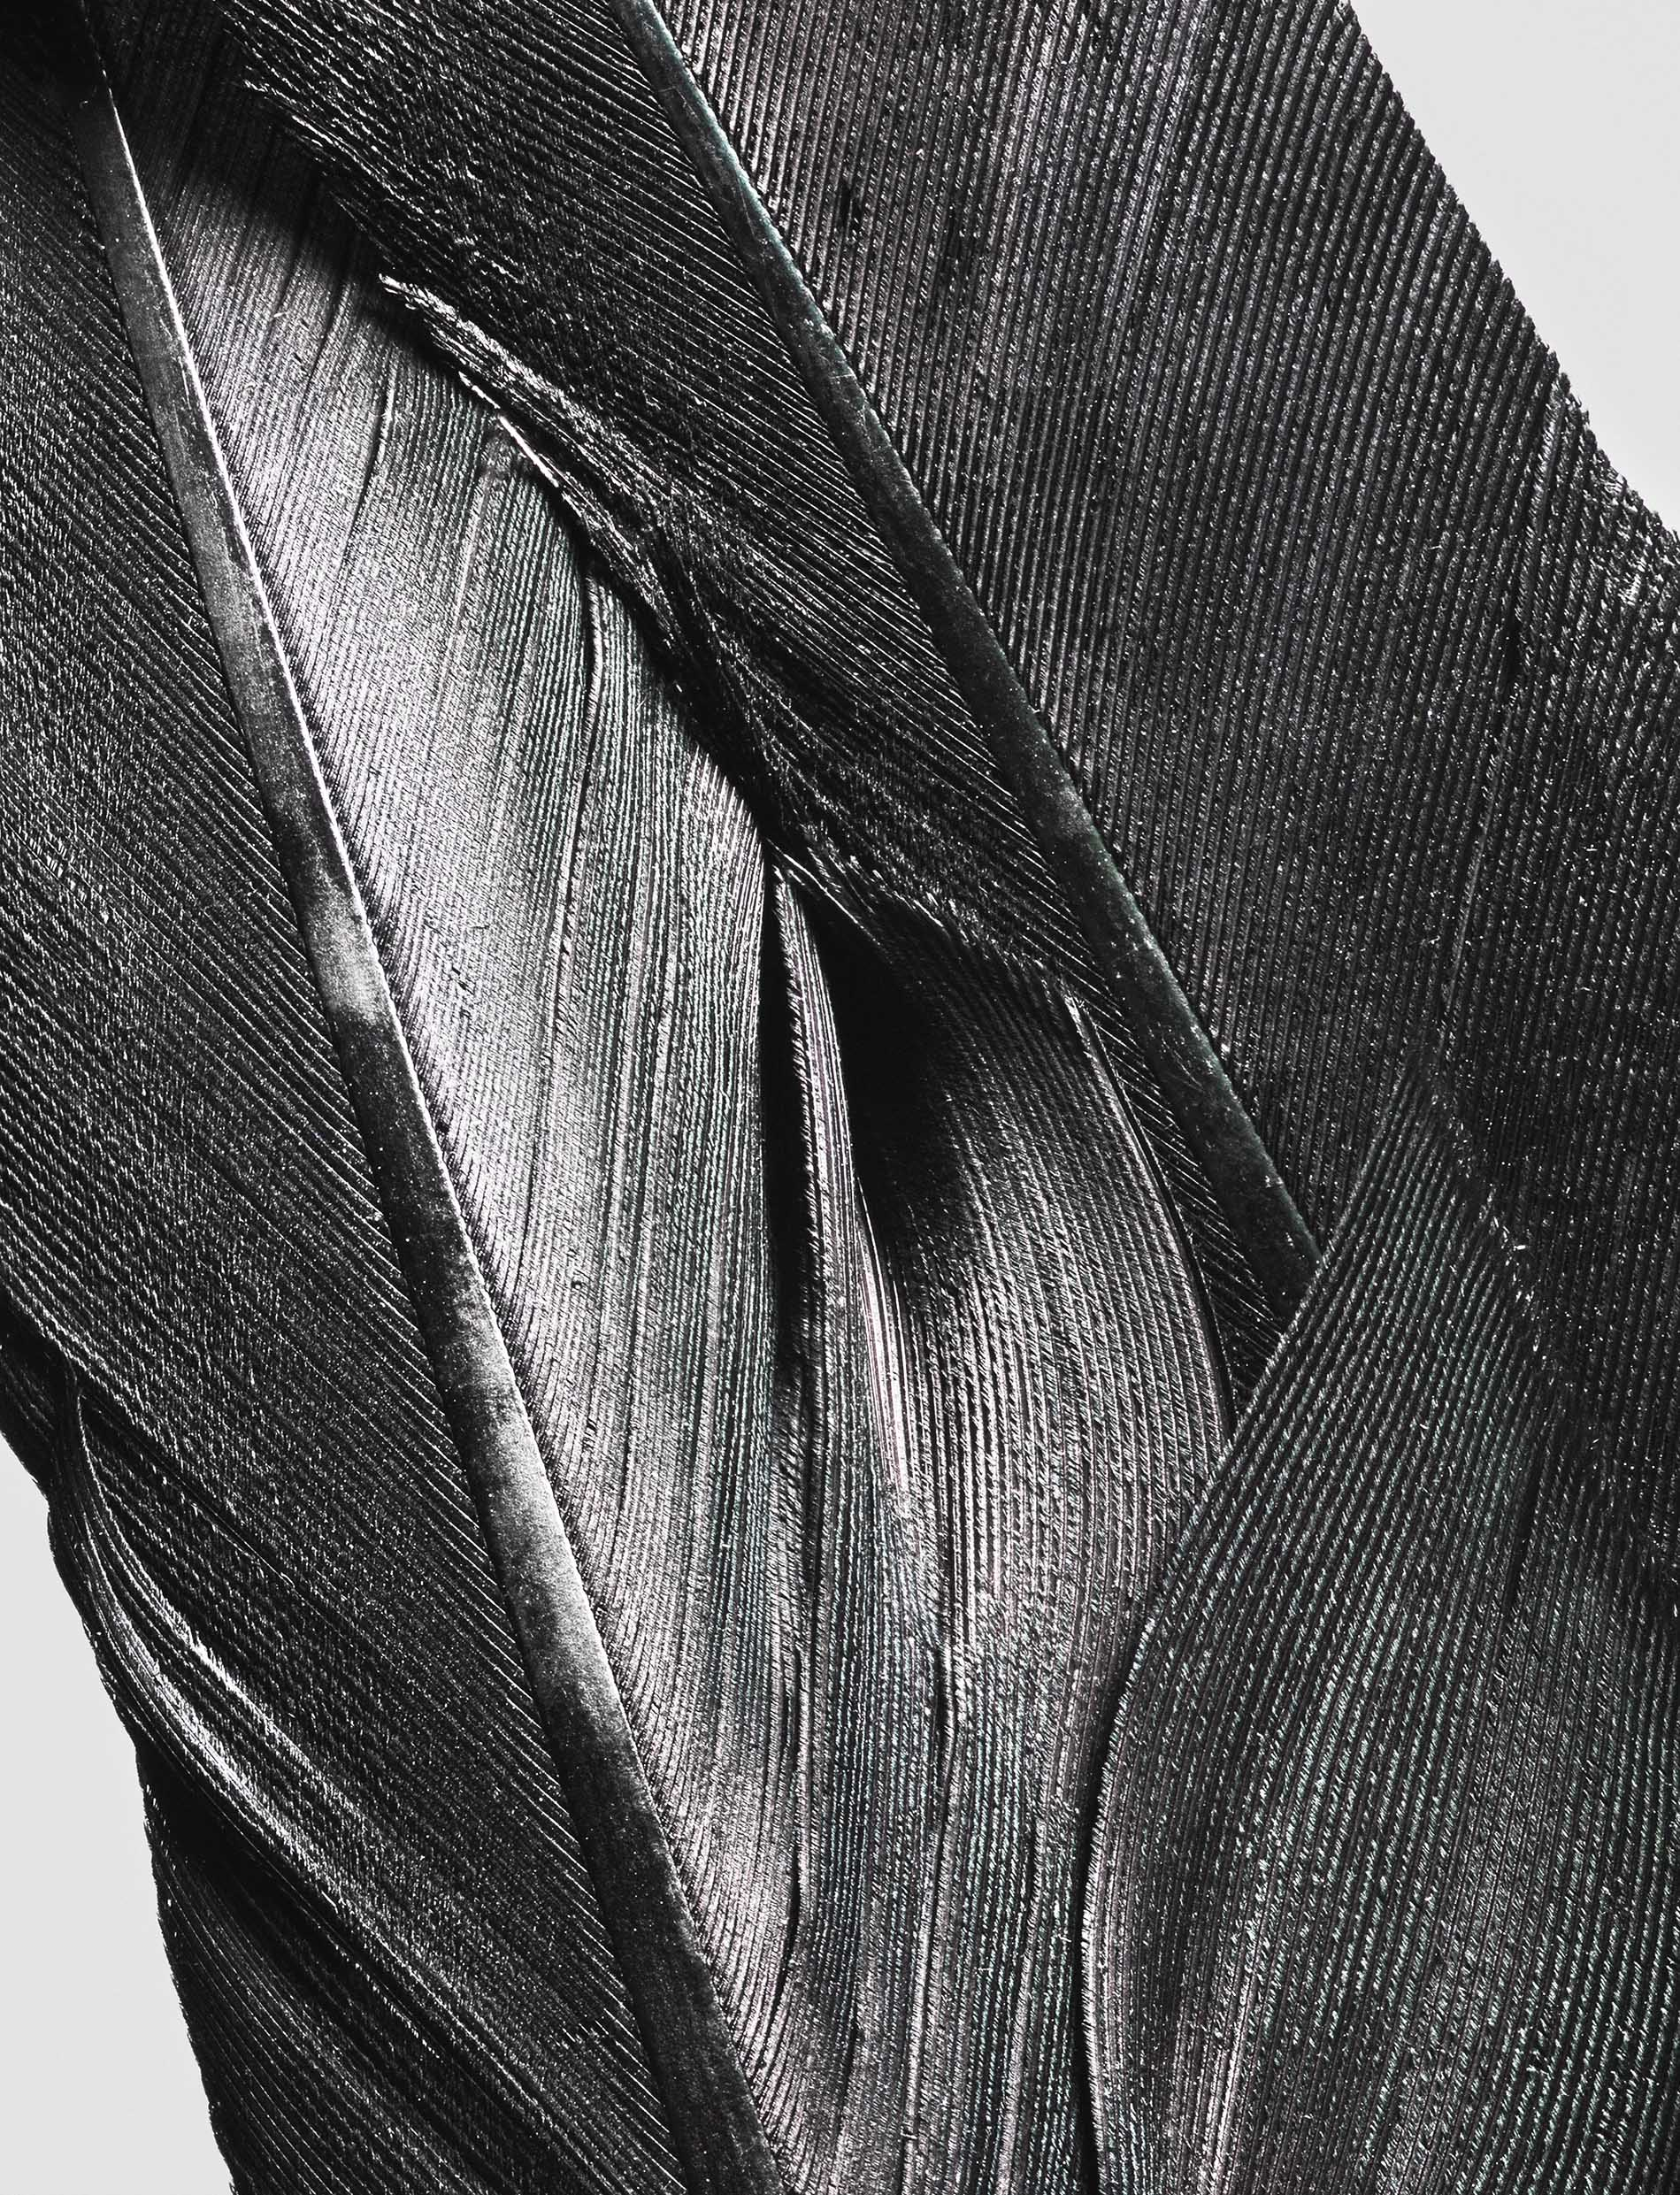 feather_04.jpg